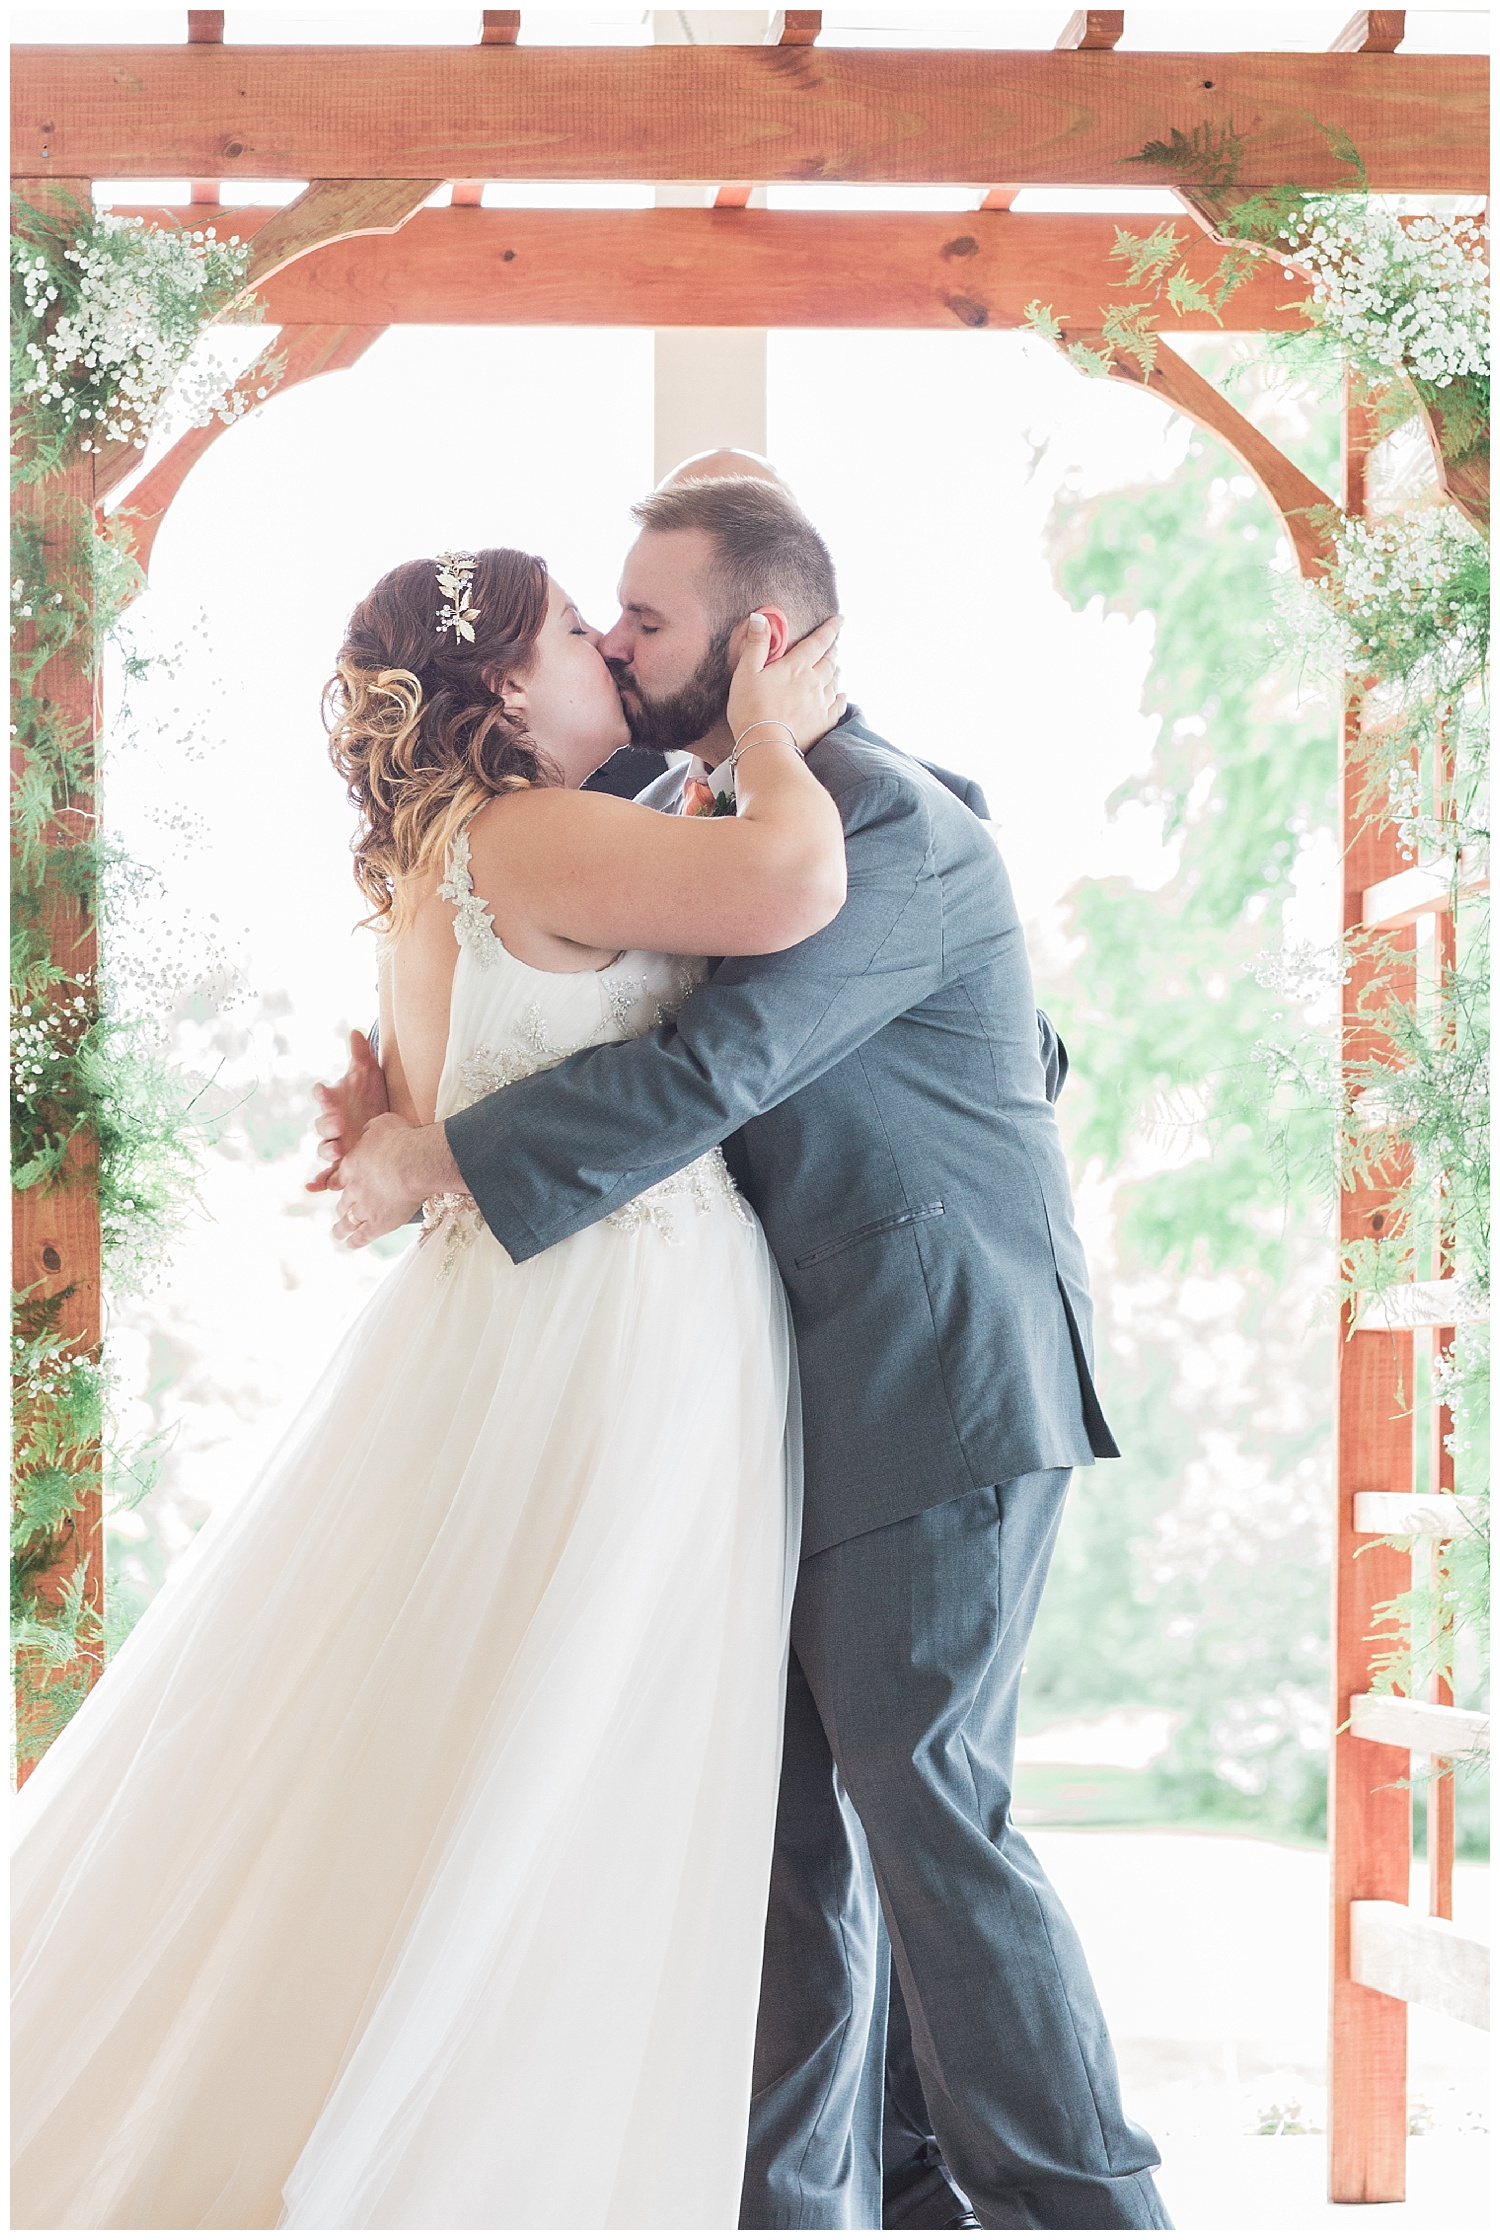 Brian and Molly Wed in Conesus NY - Lass & Beau-316_Buffalo wedding photography.jpg